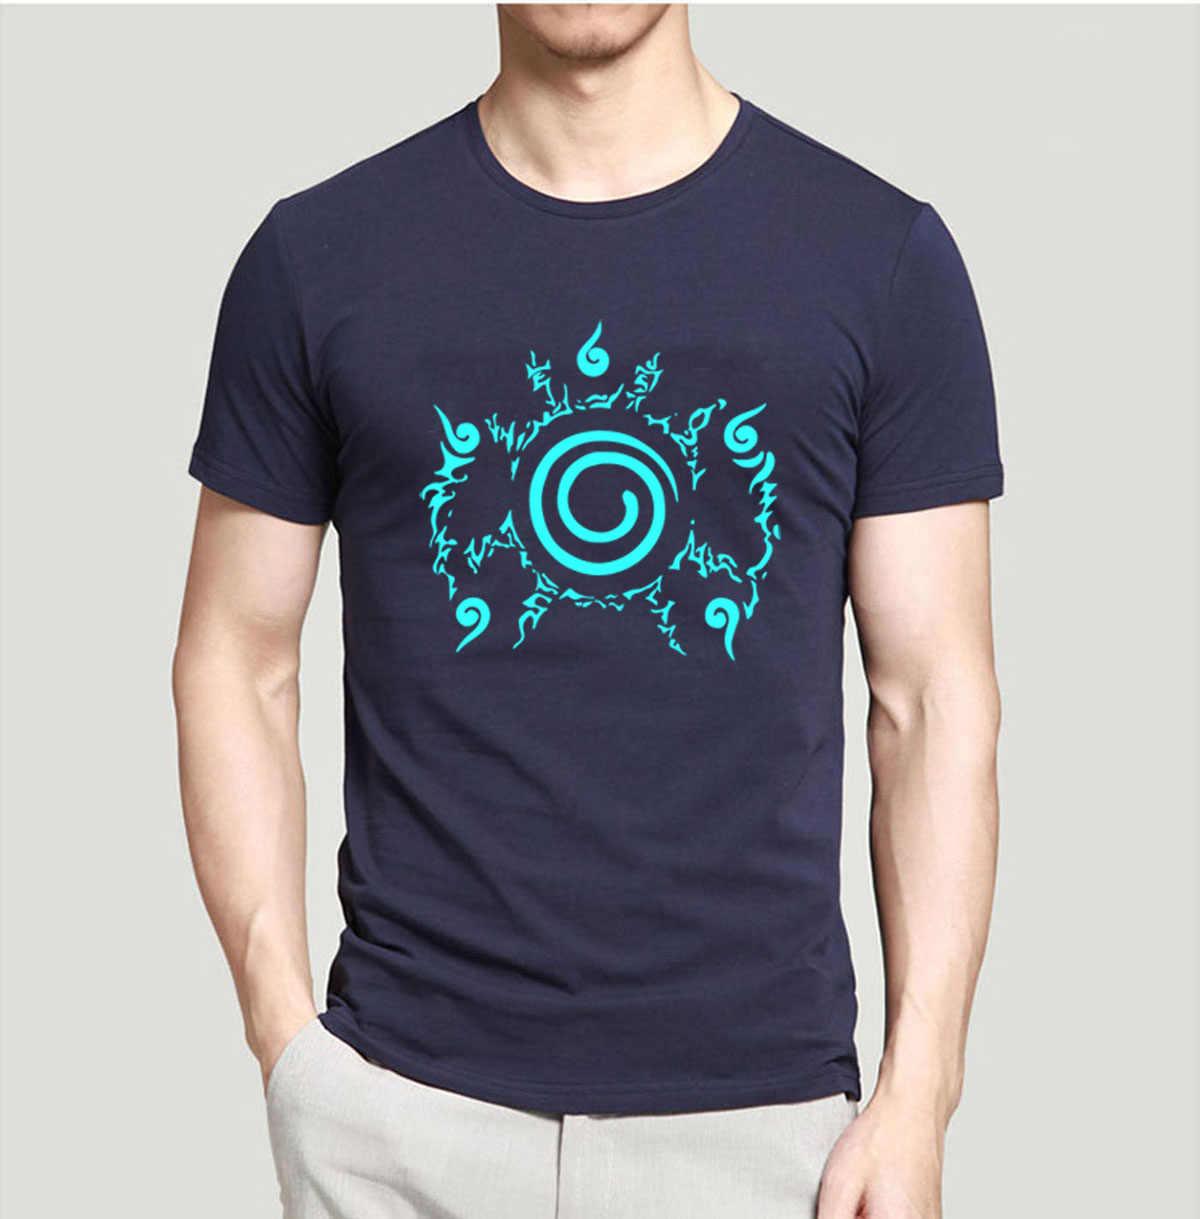 Japan Anime Naruto Nacht Licht Cool Erwachsenen T Shirts 2019 Sommer Mode Oansatz T Hemd 100% Baumwolle Männer T-Shirts Erwachsene tops Tees